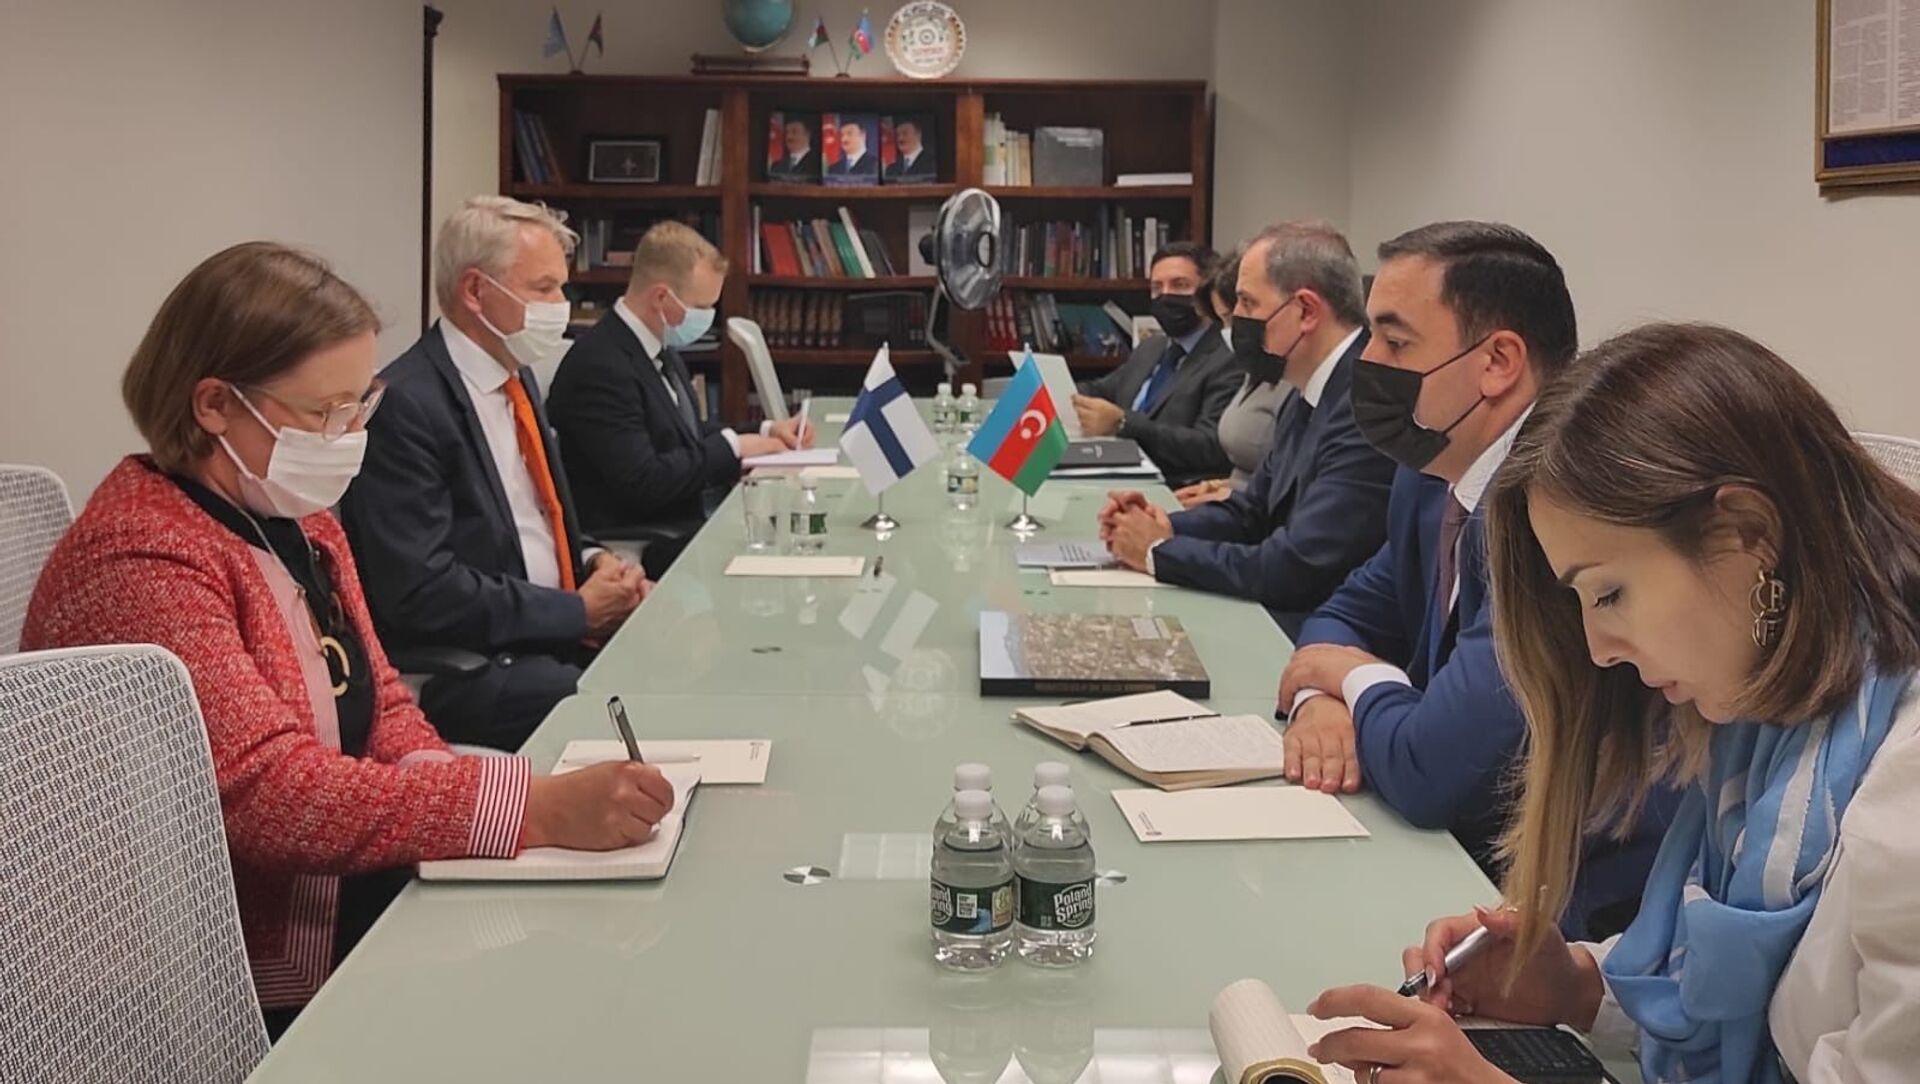 Джейхун Байрамов в ходе встречи с главой финского МИД Пеккой Хаависто - Sputnik Азербайджан, 1920, 23.09.2021